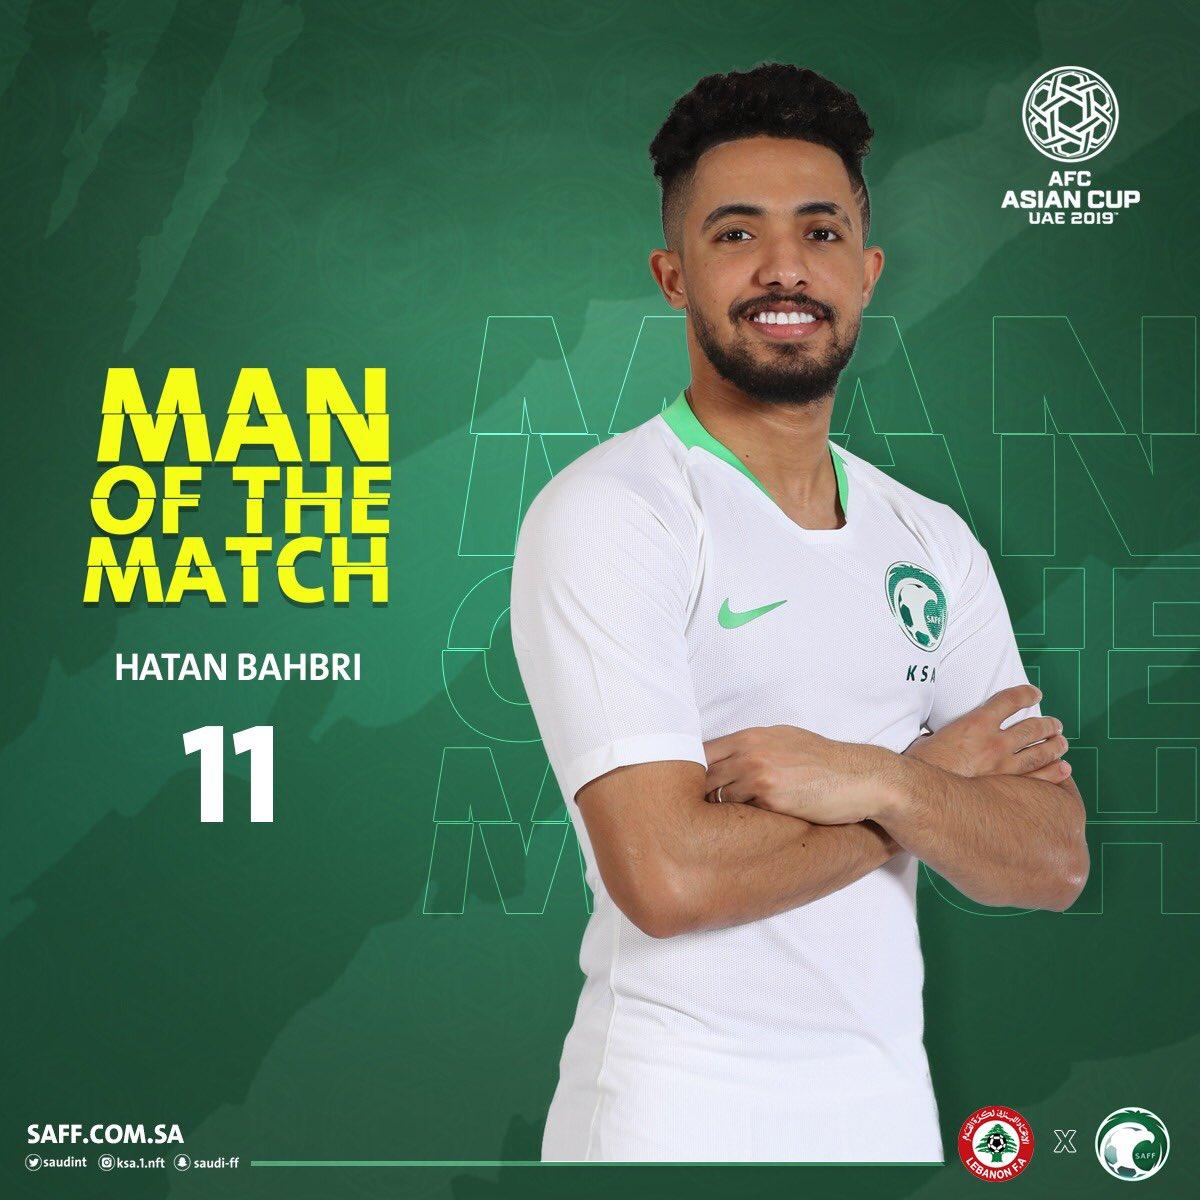 RT @SaudiNT: الاتحاد الآسيوي يختار هتان باهبري كأفضل لاعب في المباراة. #لبنان_السعودية #معاك_يالأخضر https://t.co/dq6CZ5l0gf